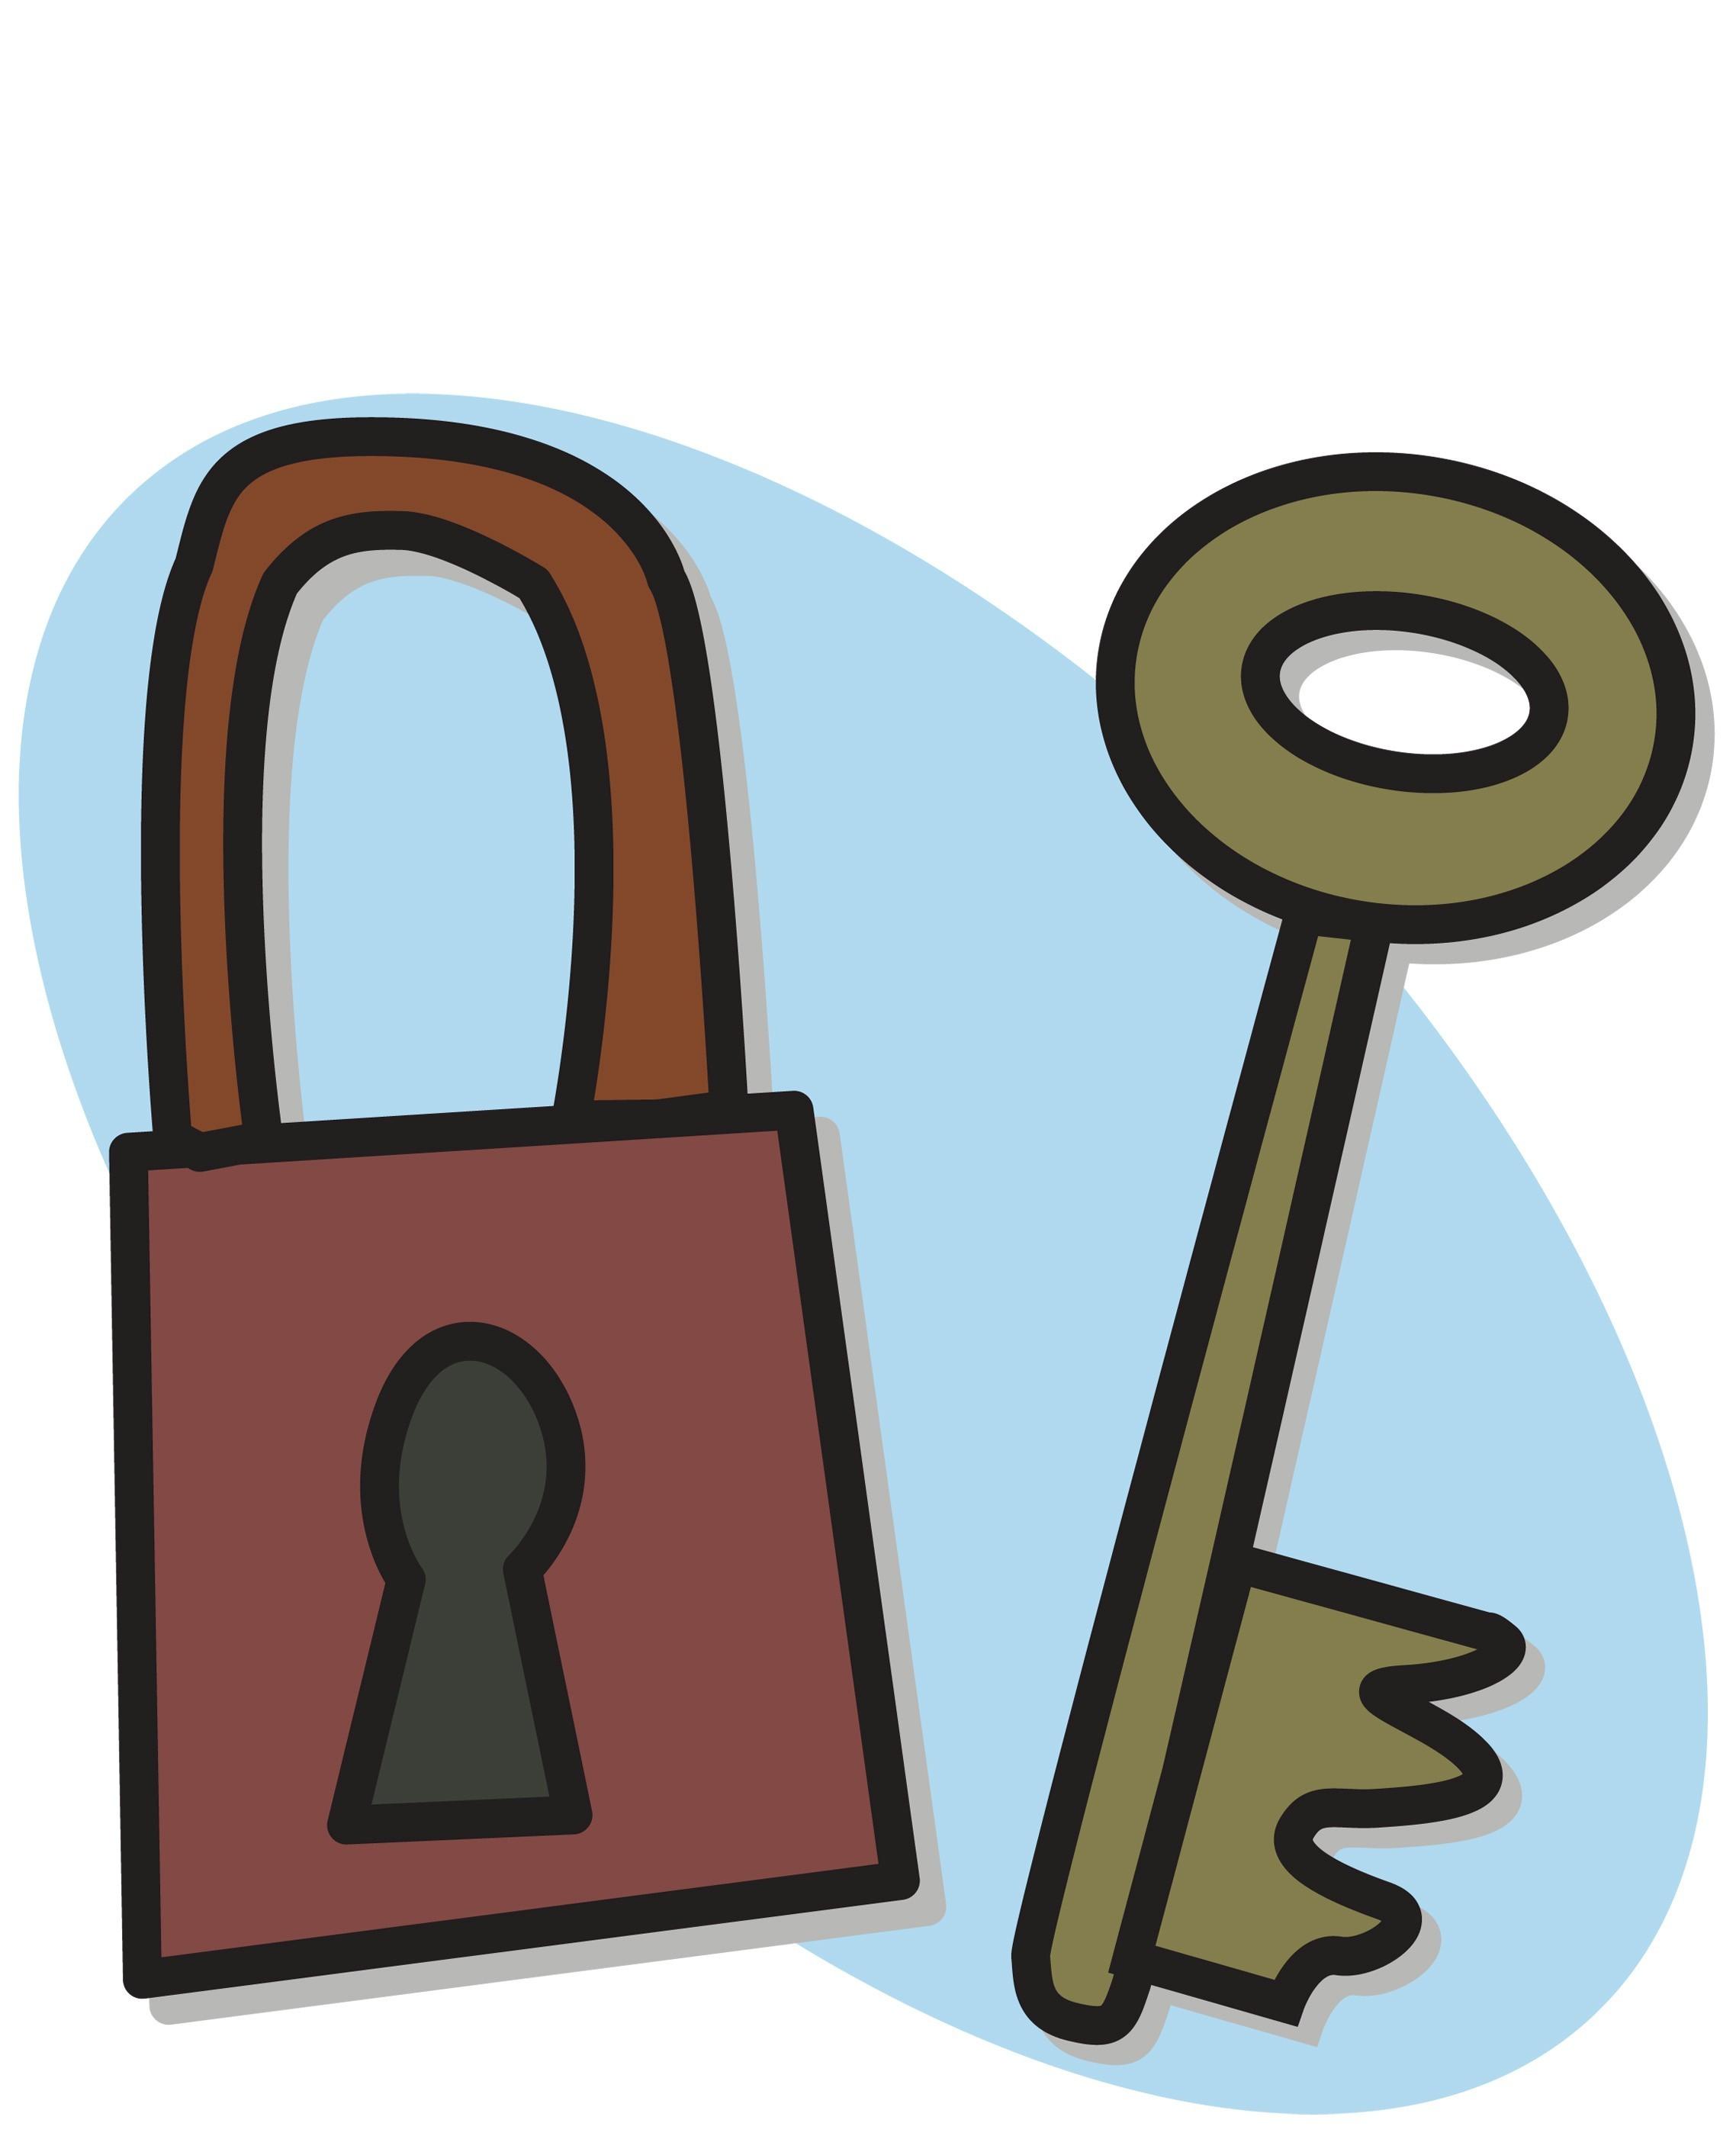 e352f8342a3b75c28ed8_lock_and_key.jpg